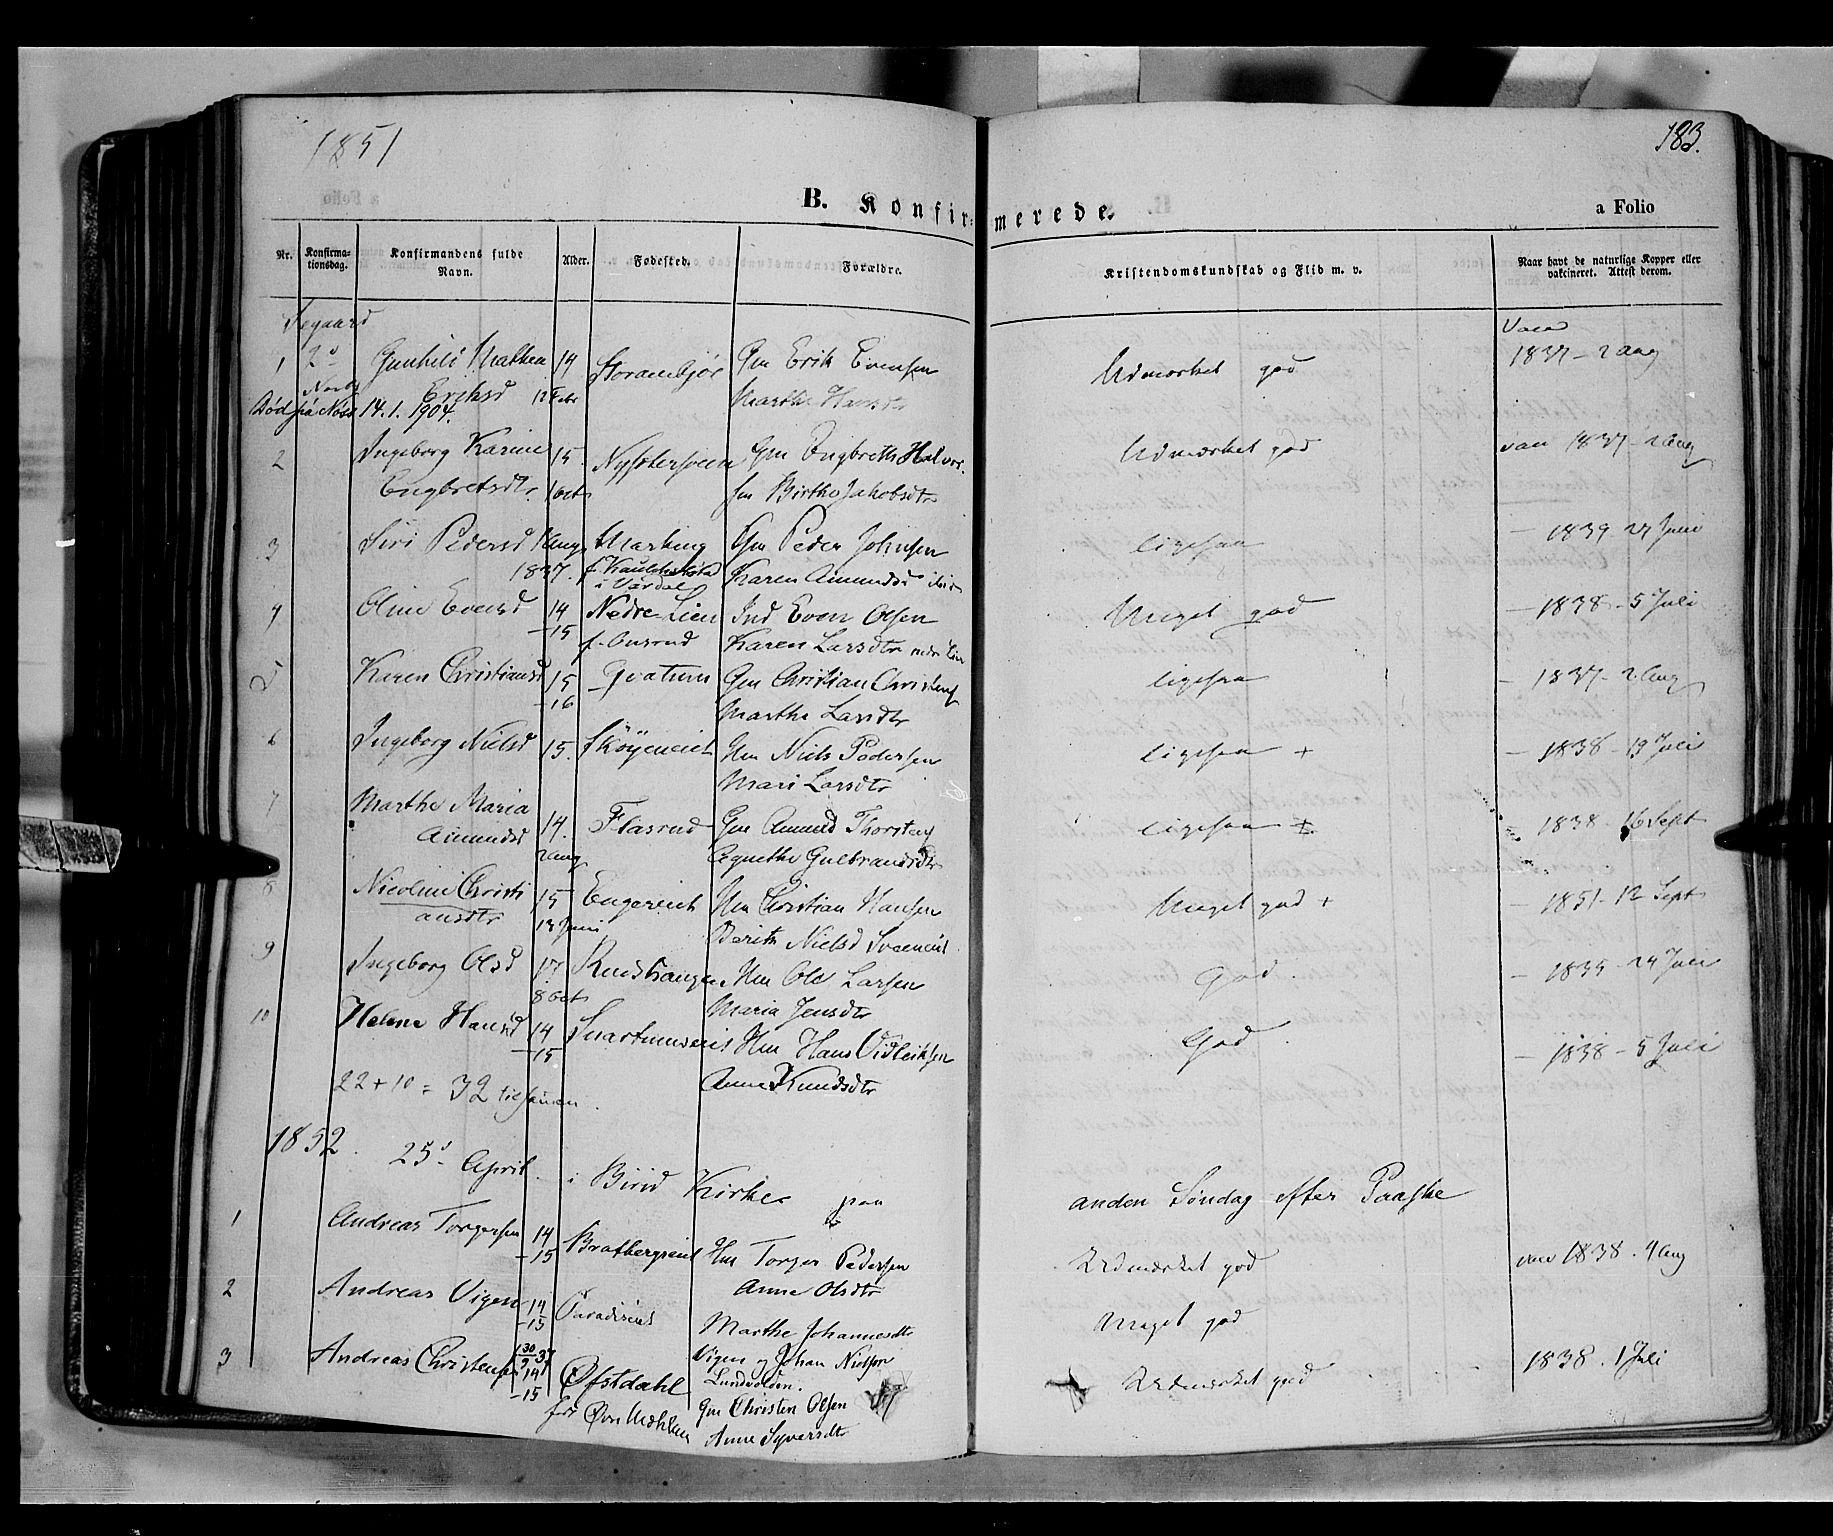 SAH, Biri prestekontor, Ministerialbok nr. 5, 1843-1854, s. 183